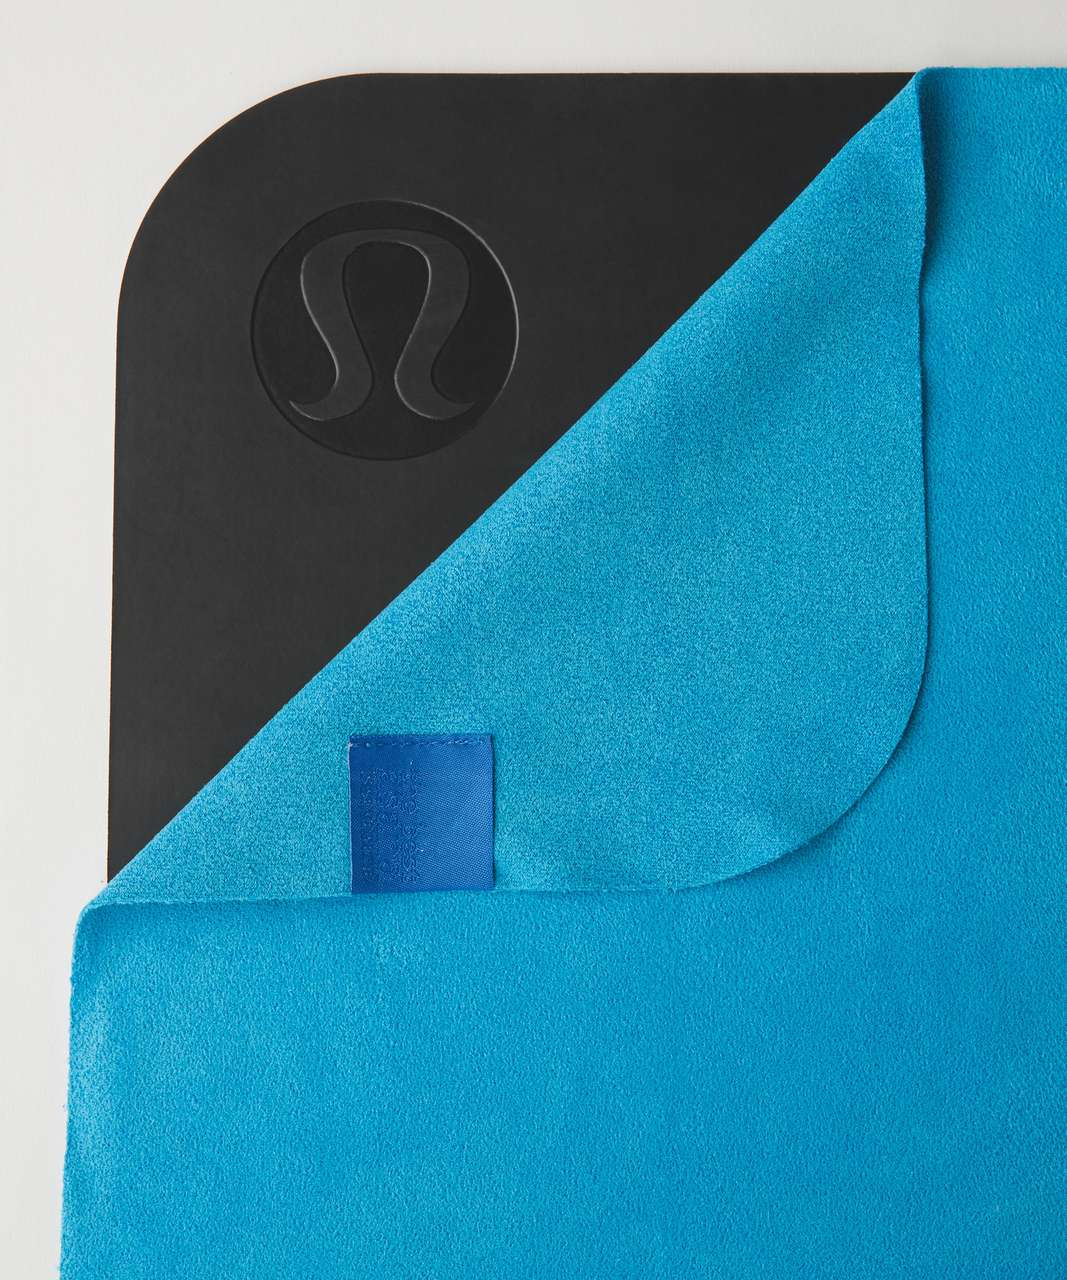 Lululemon The (Small) Towel - Kayak Blue